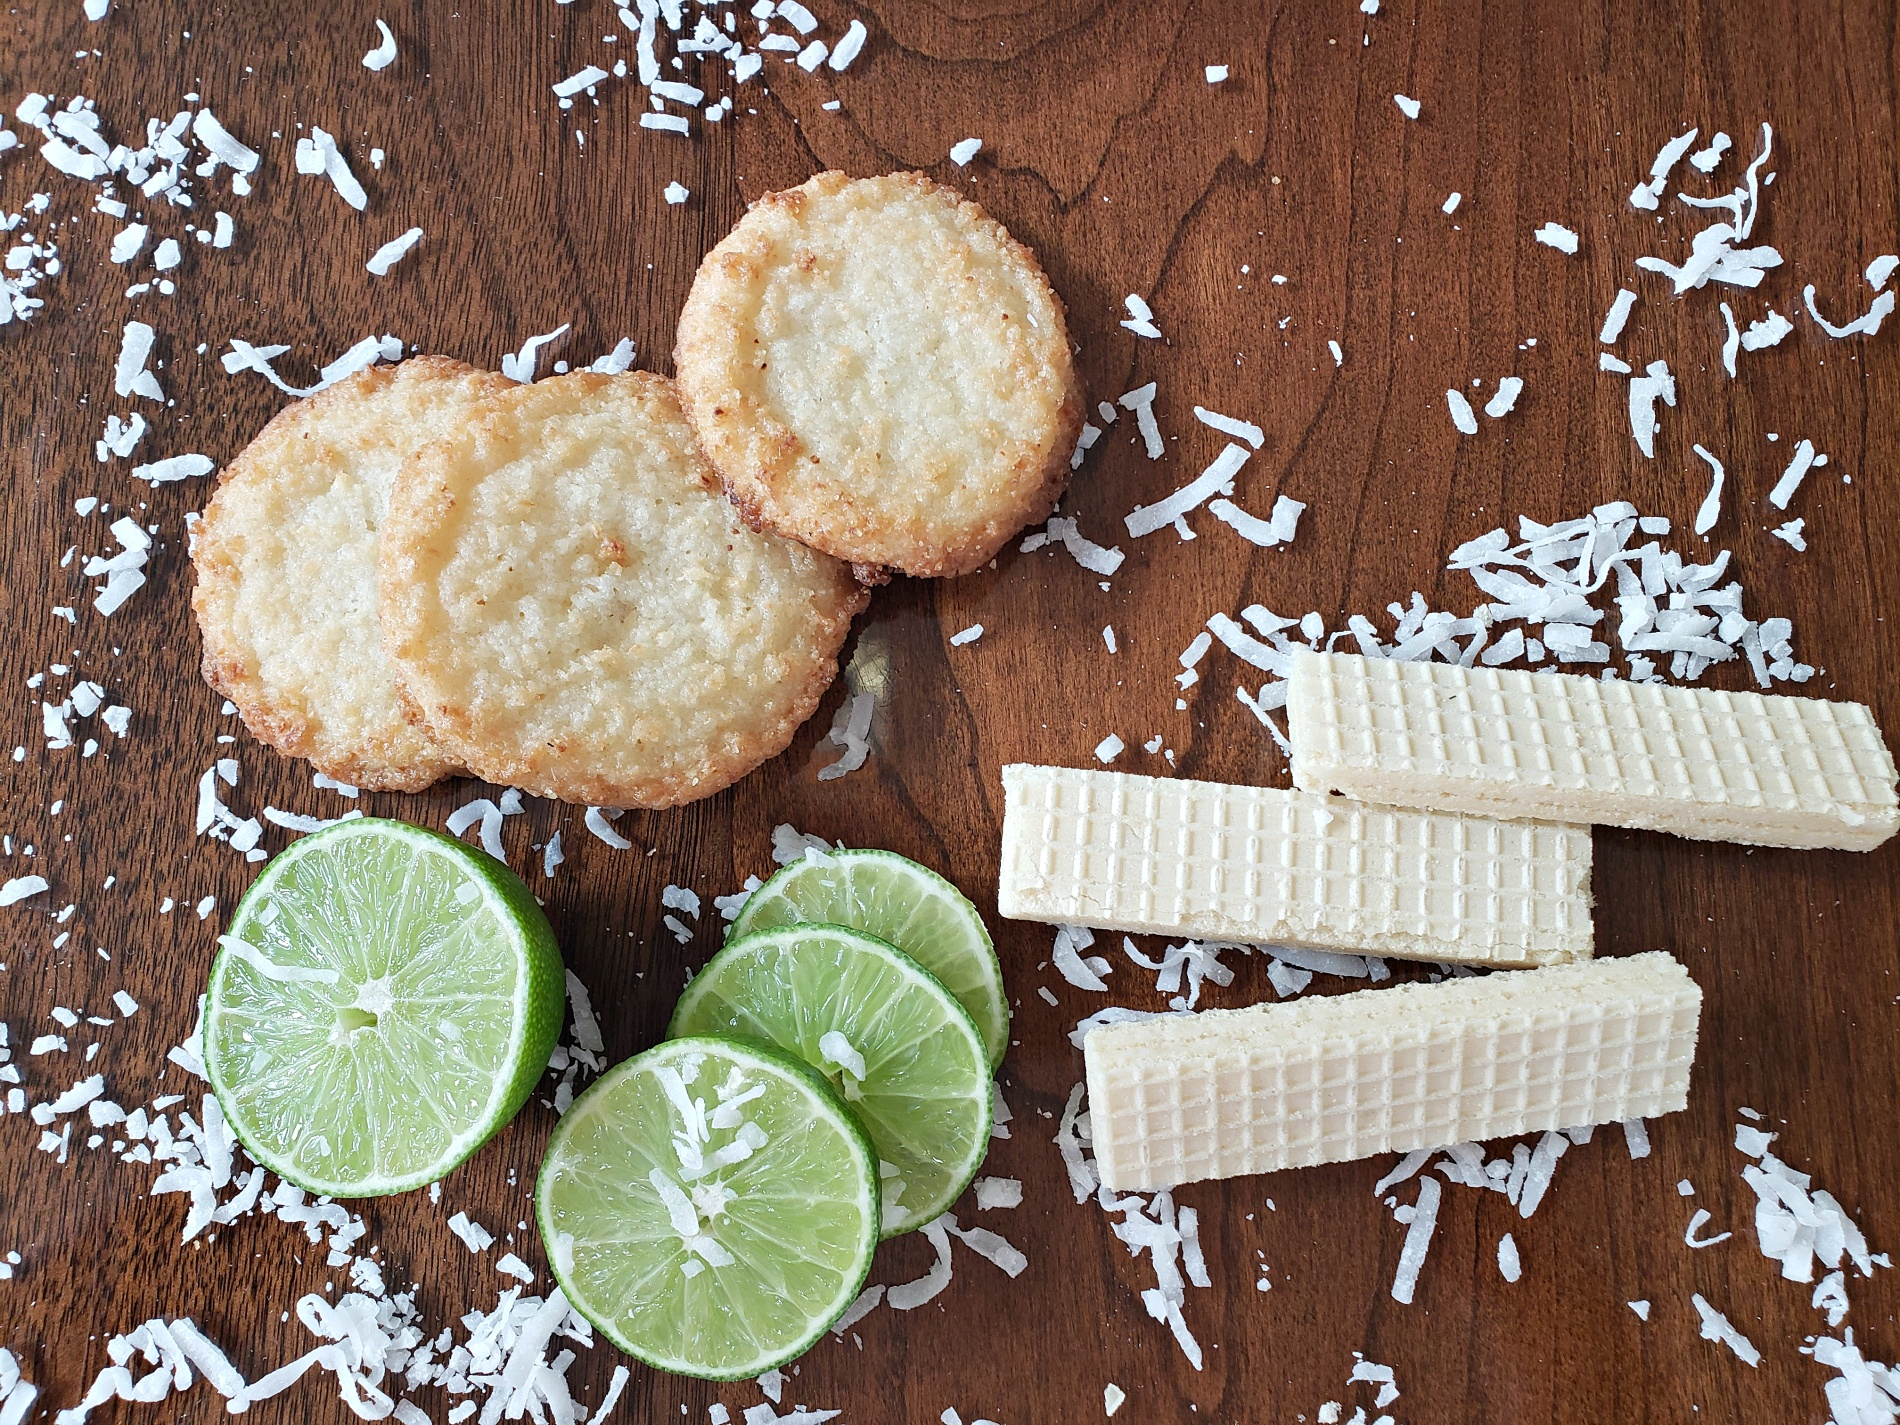 Voortman Bakery Key Lime Wafers